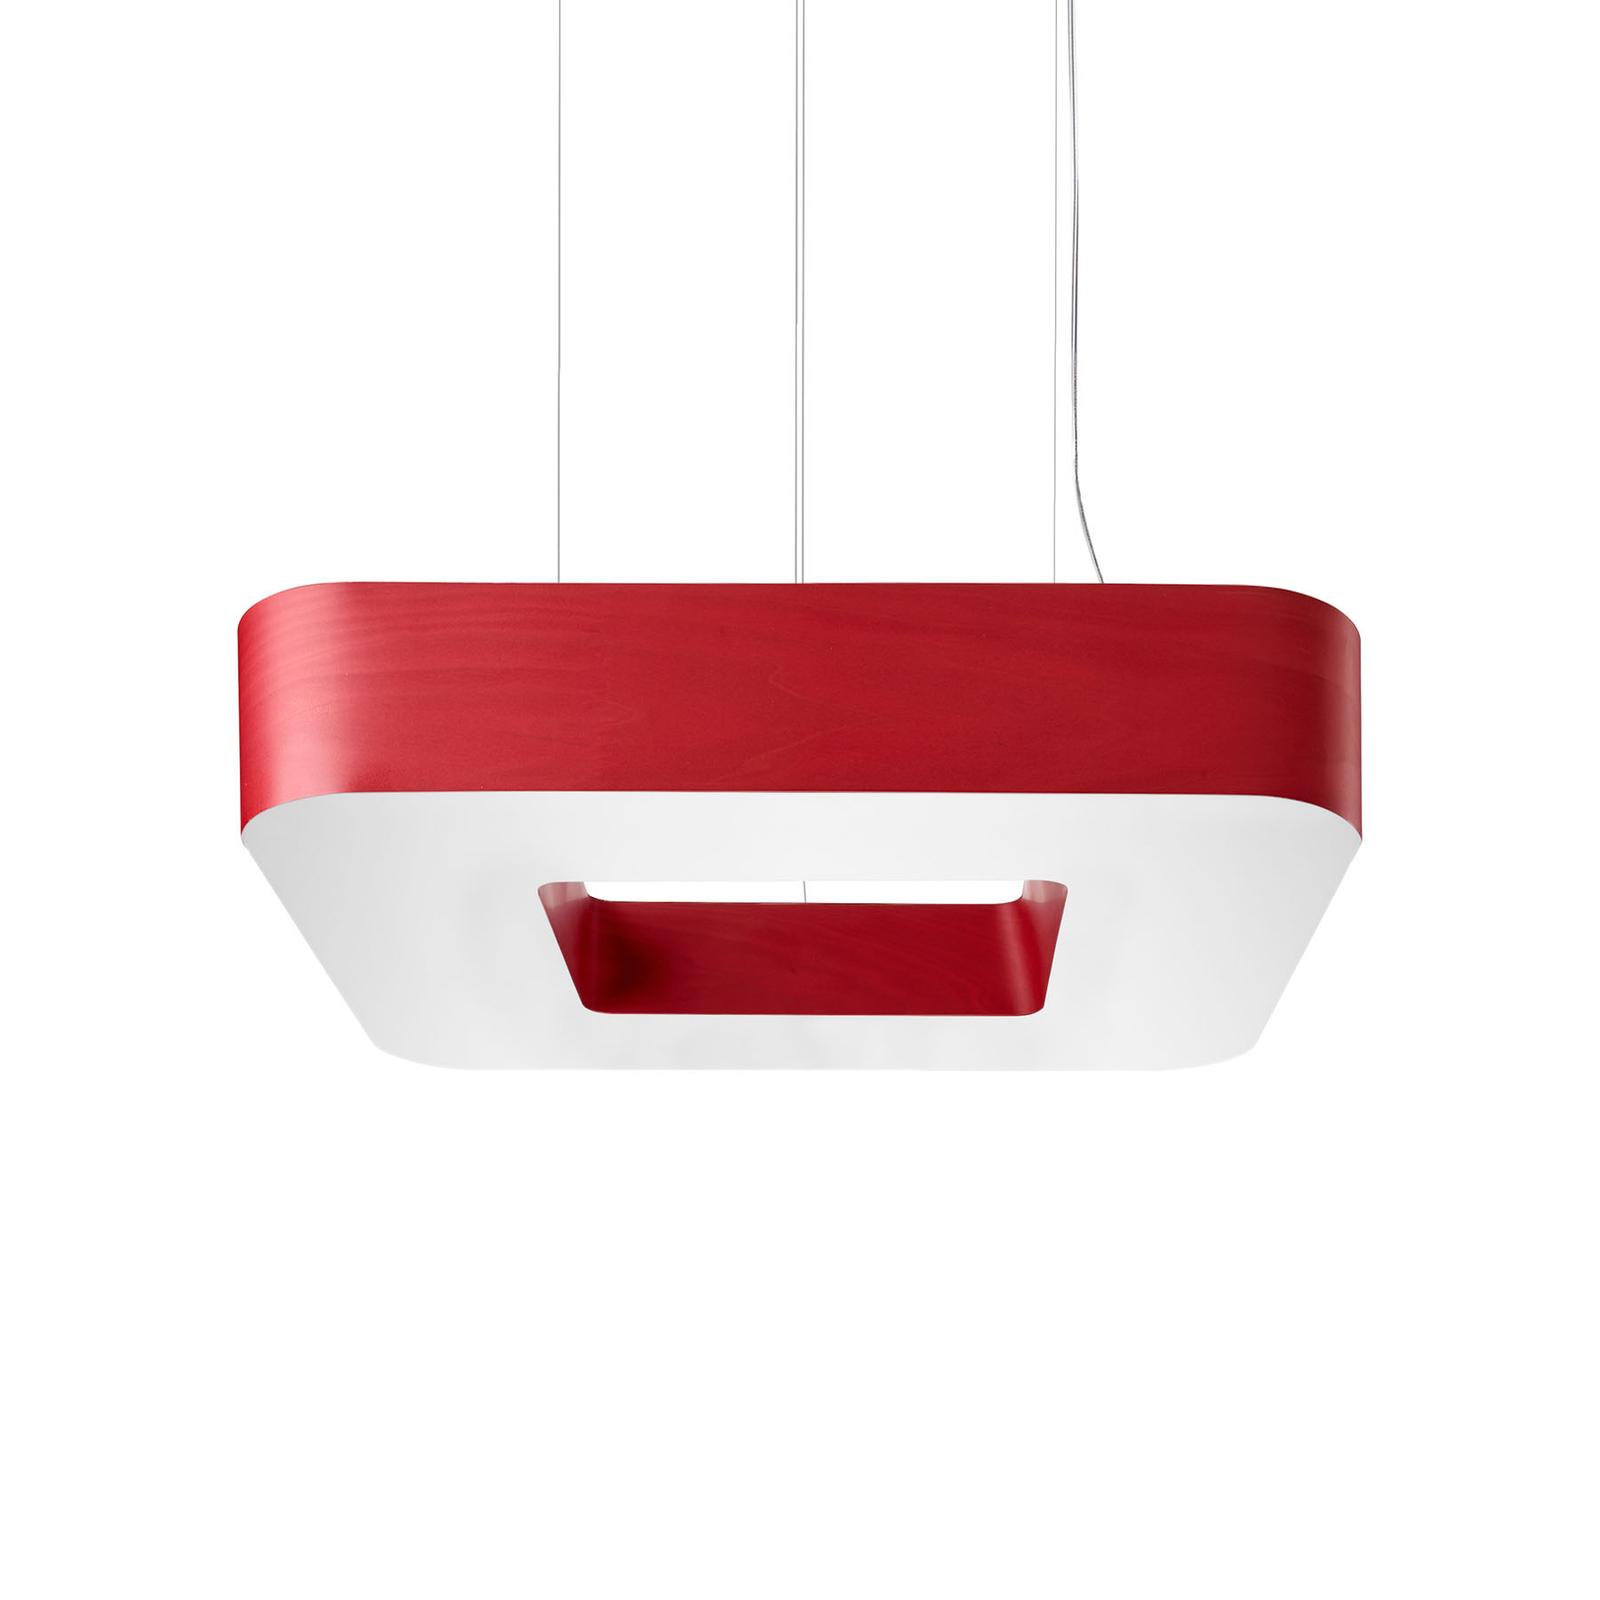 LZF Cuad LED-Hängeleuchte 0-10V dim, rot